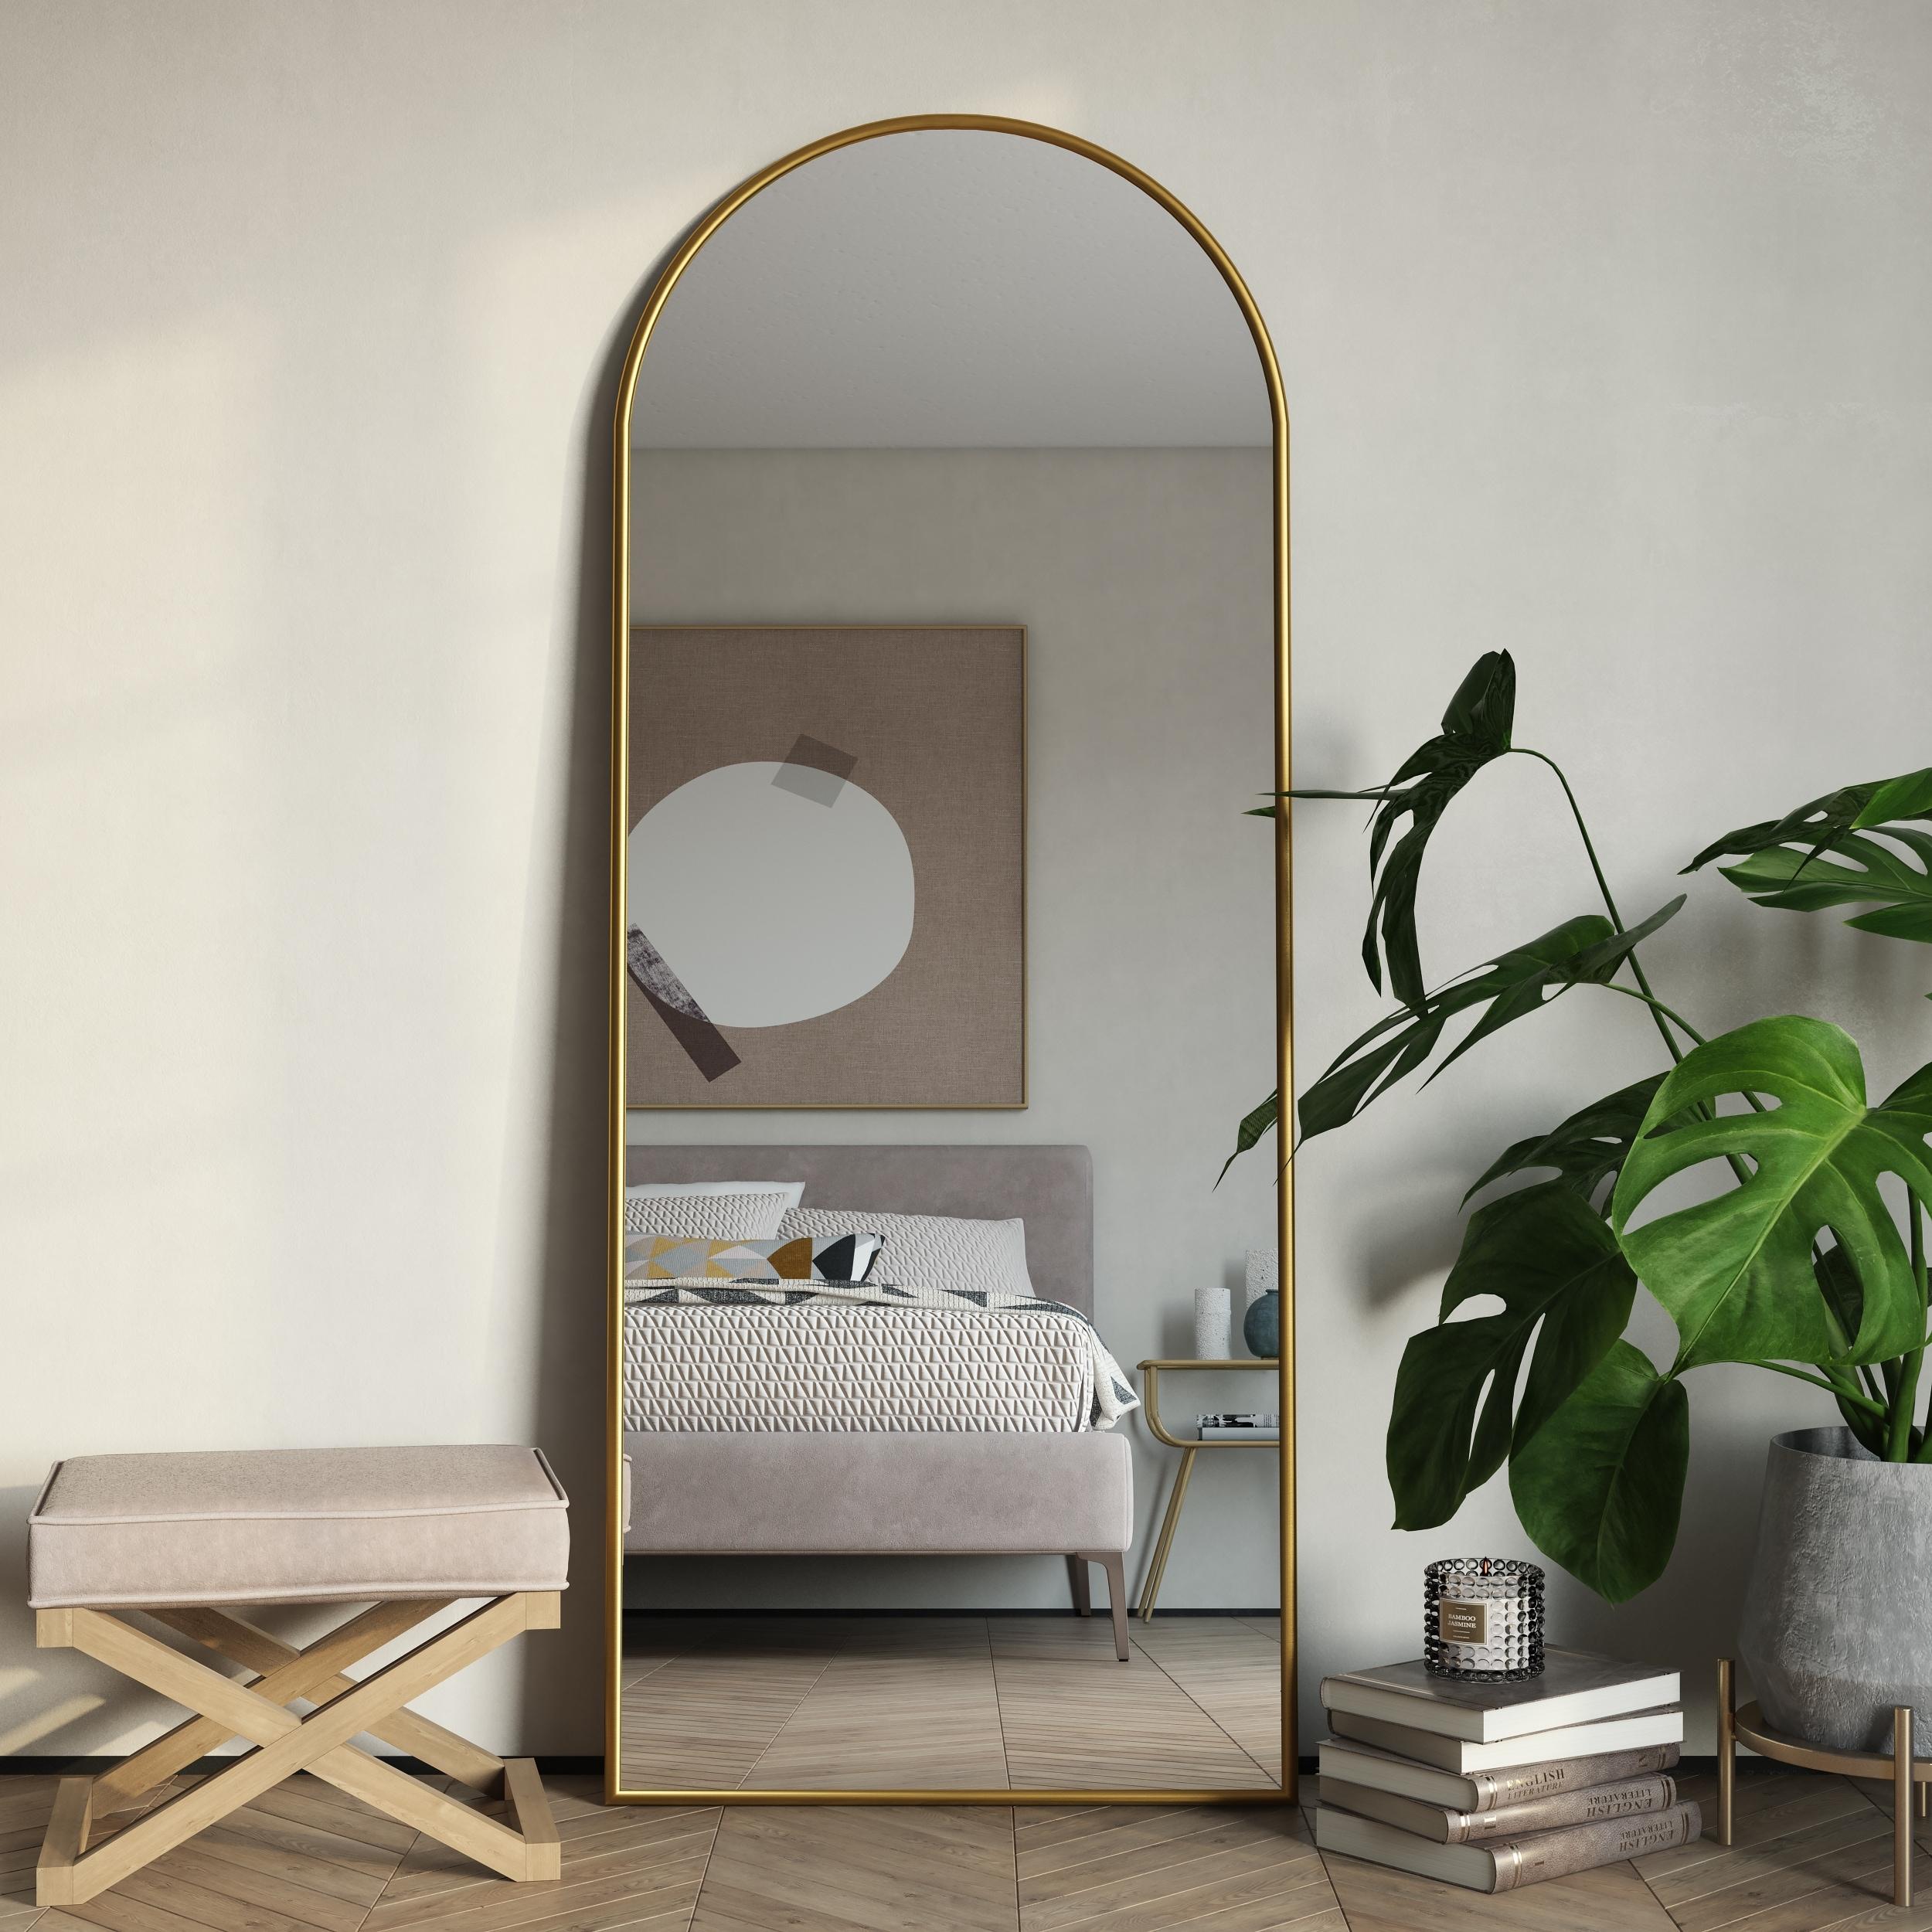 Nadia Modern Arch Floor Mirror 70 H X 28 W X 1 5 D Overstock 31053615